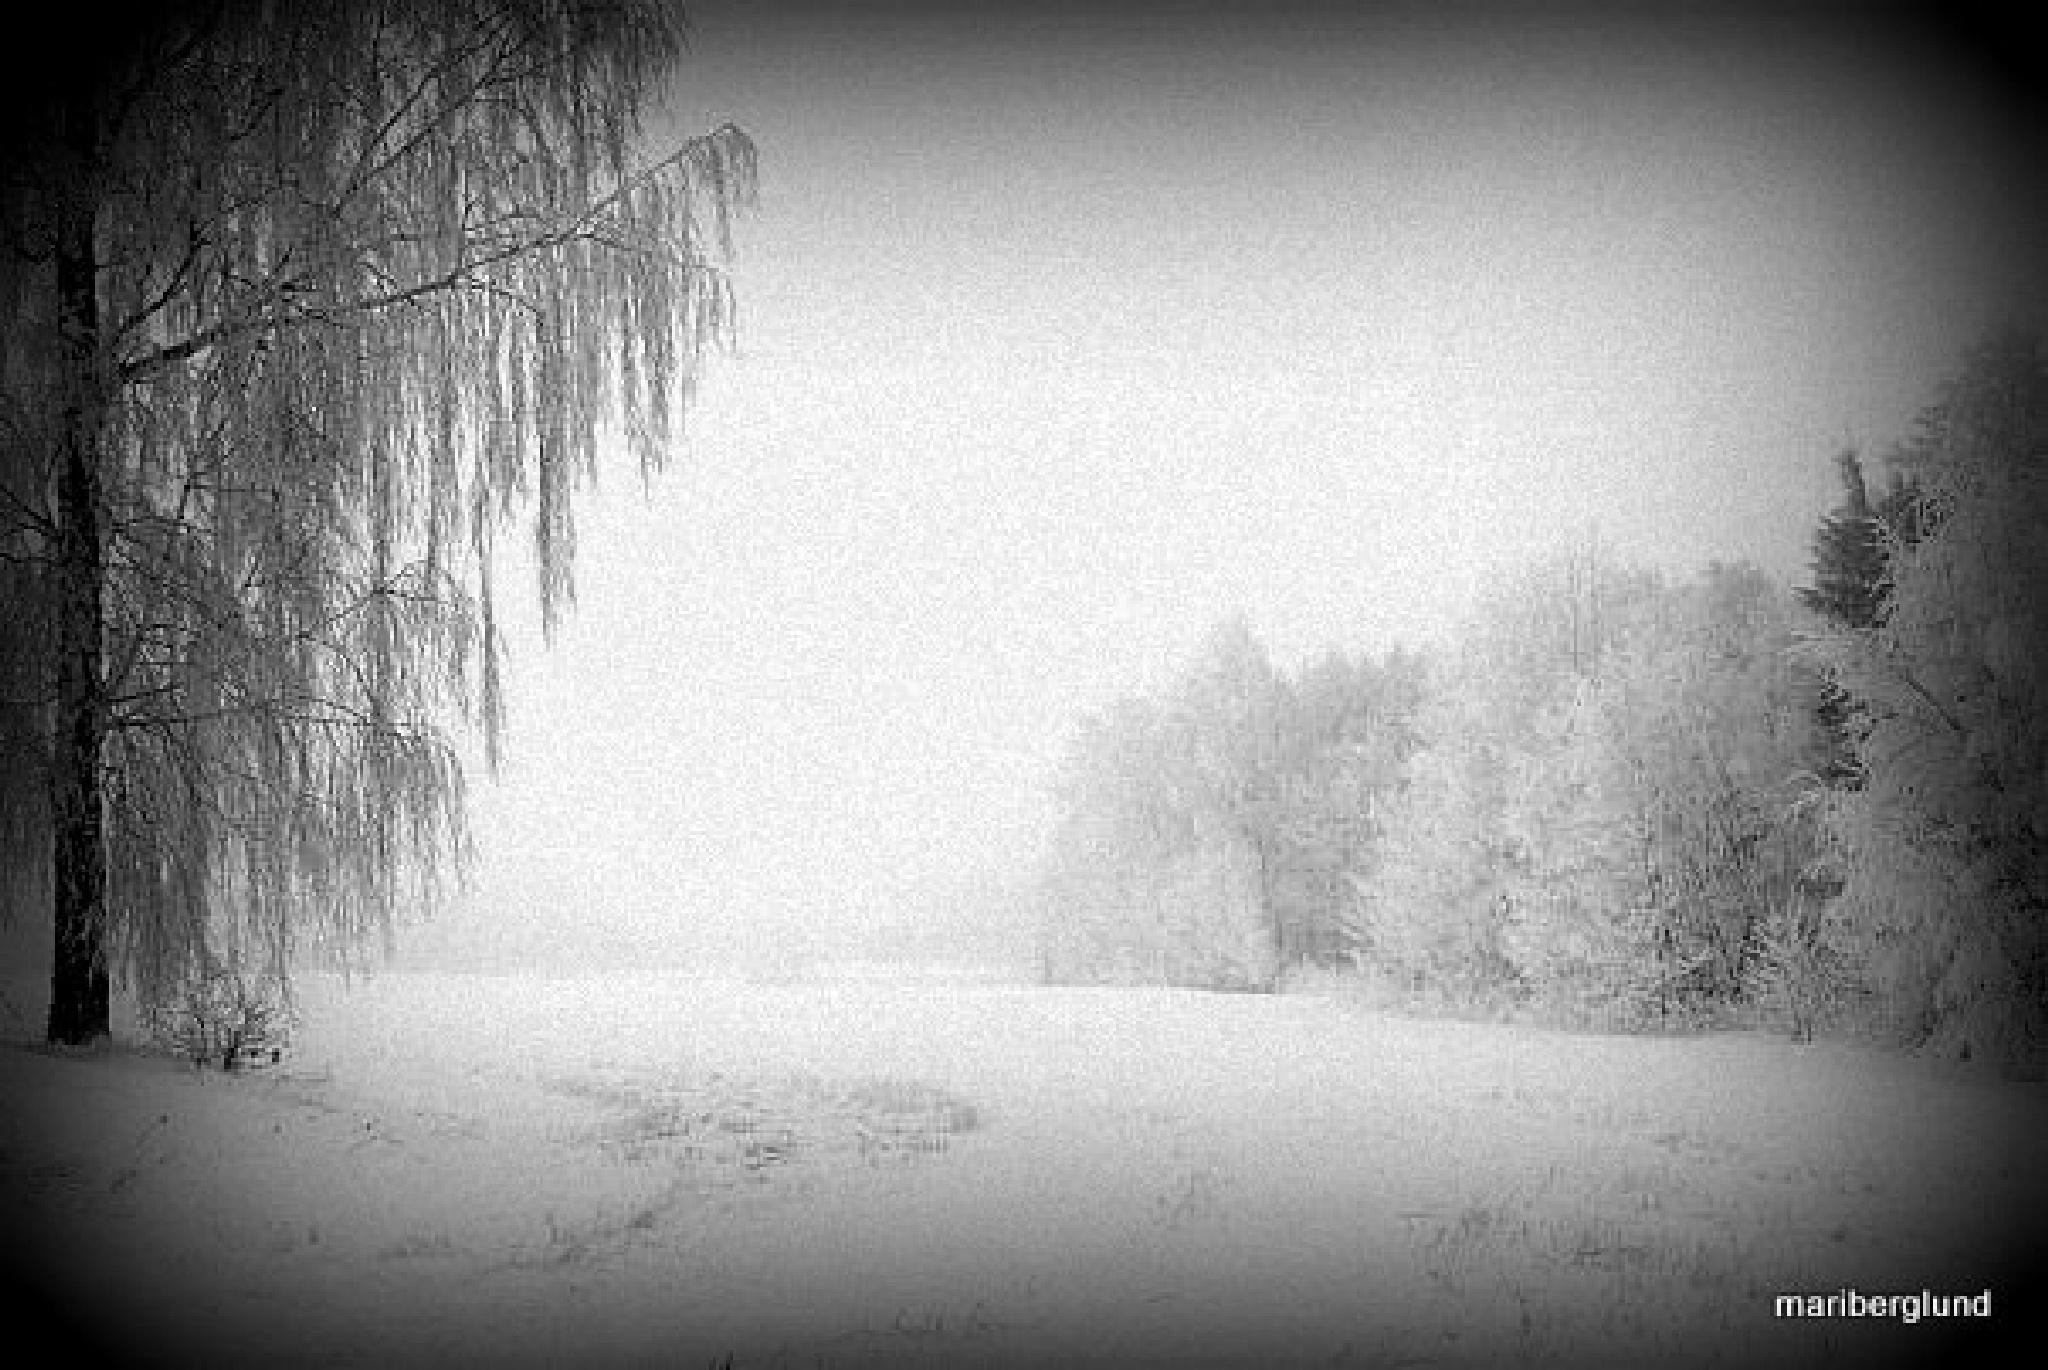 Winter morning in Sweden by mari.berglund.5